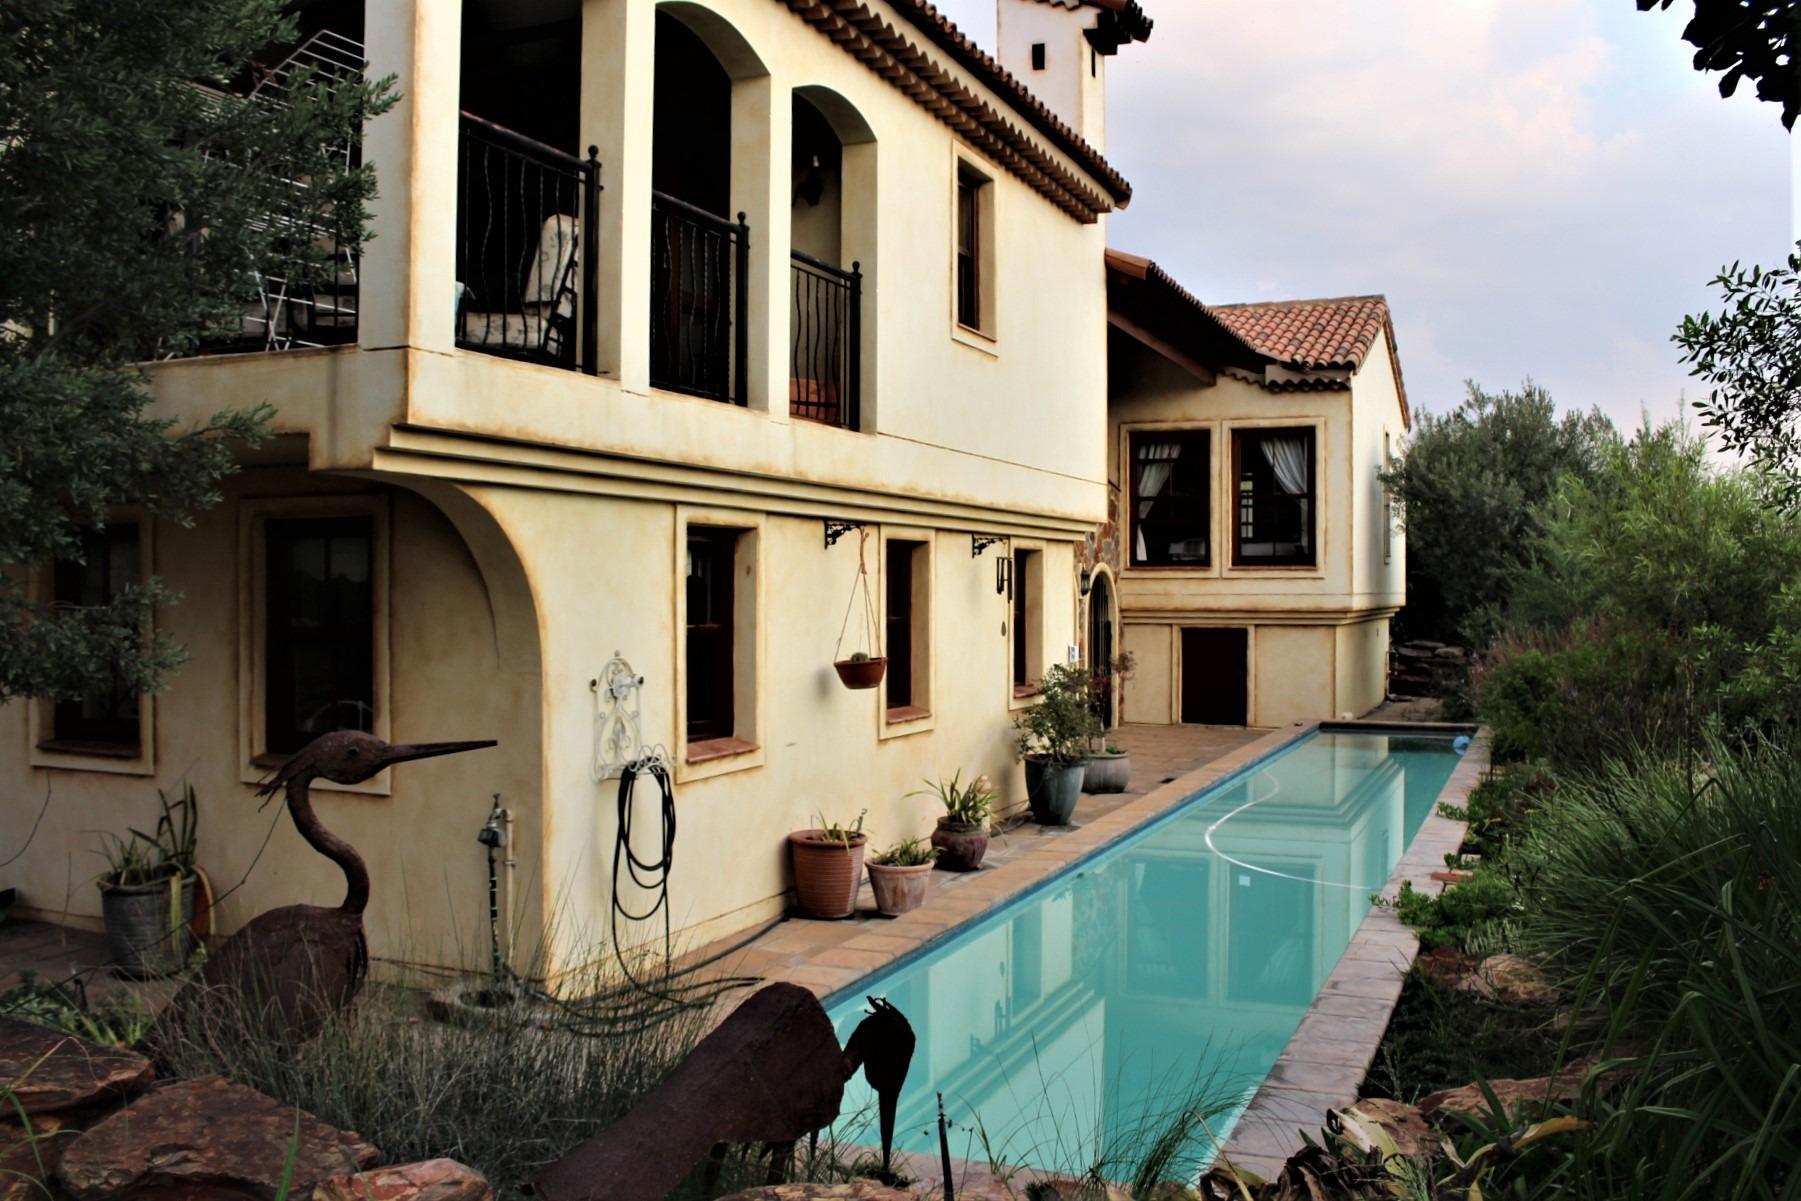 House Rental Monthly in Estate D' Afrique